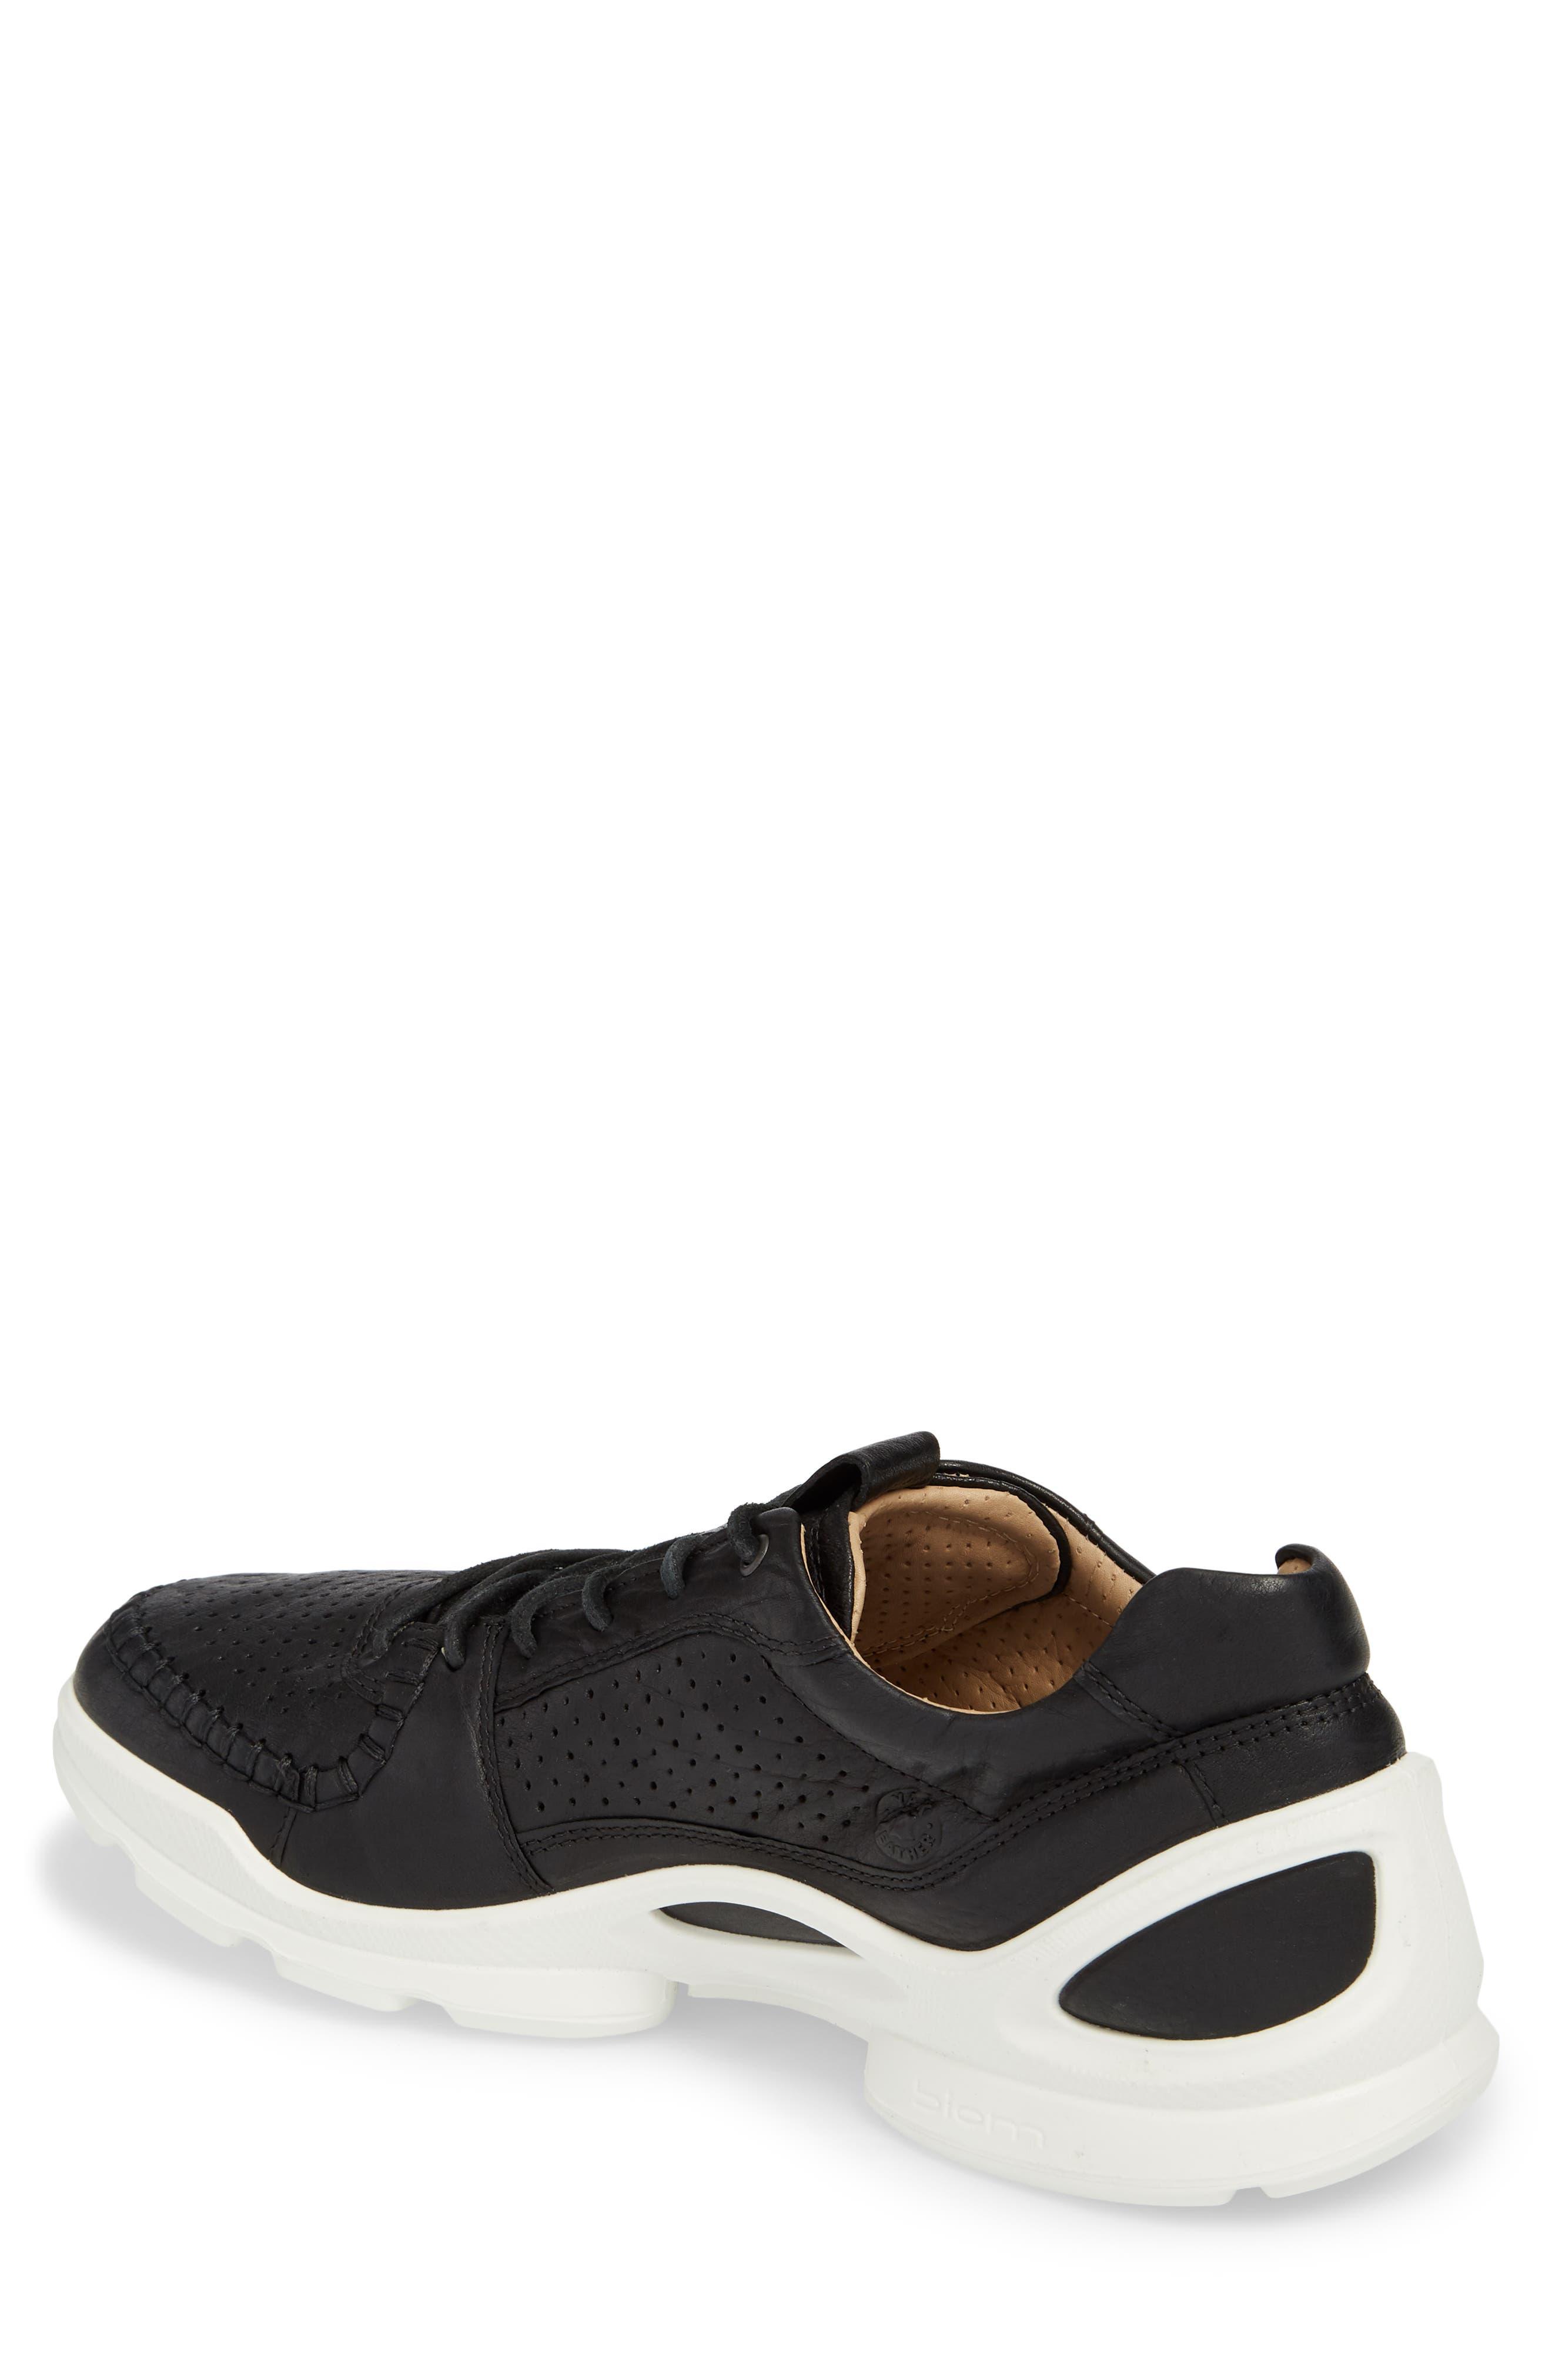 BIOM Street Moc Toe Sneaker,                             Alternate thumbnail 2, color,                             008